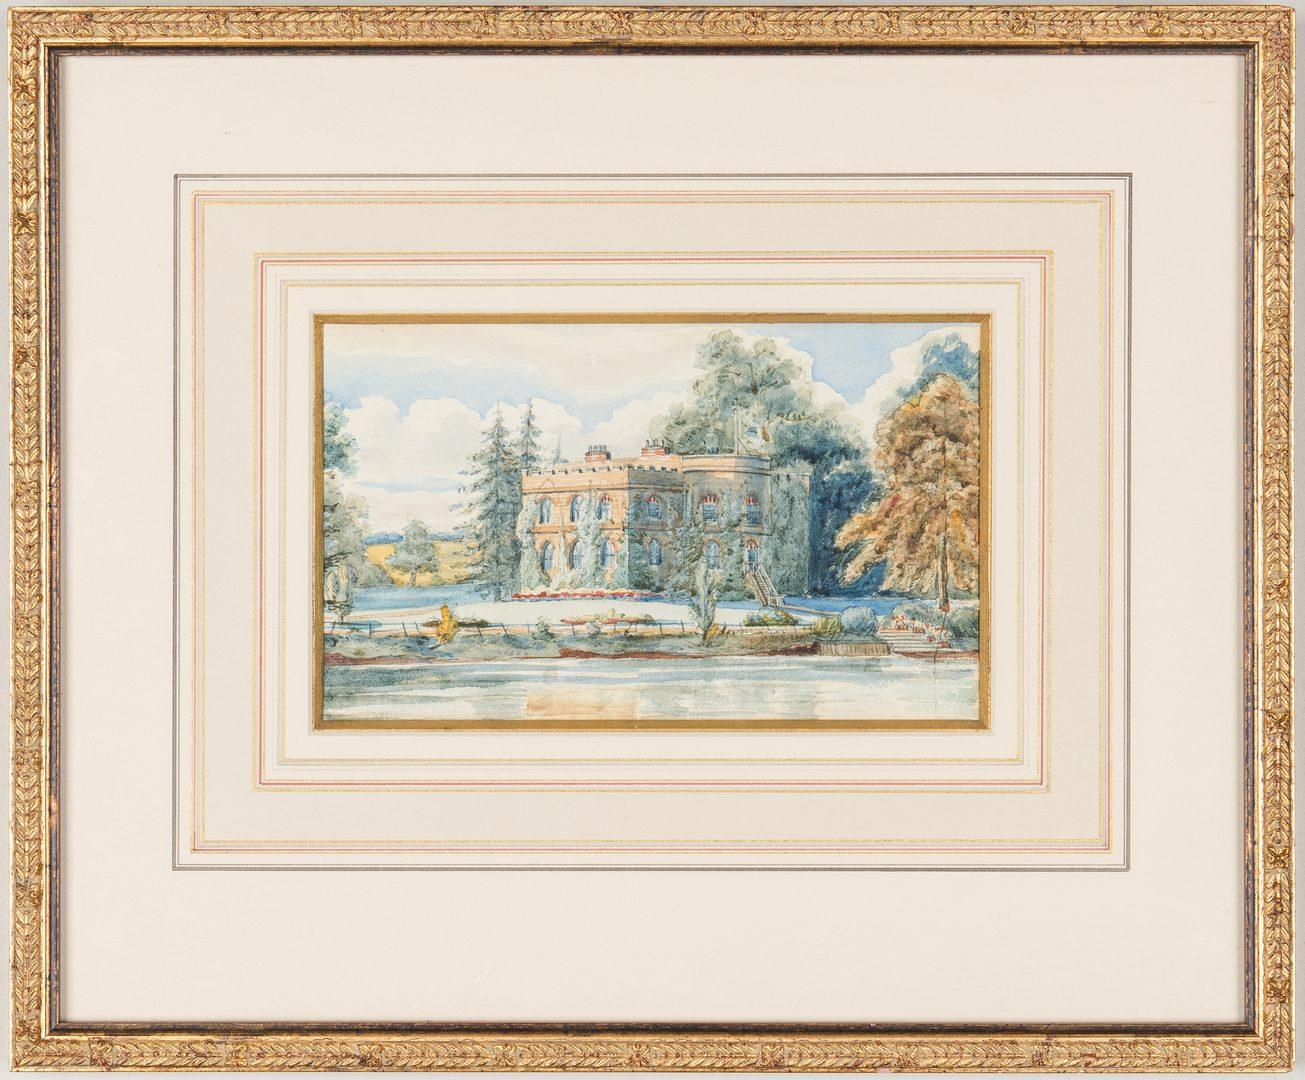 Lot 197: 3 European Watercolor Paintings, incl. Manor House, Butterflies